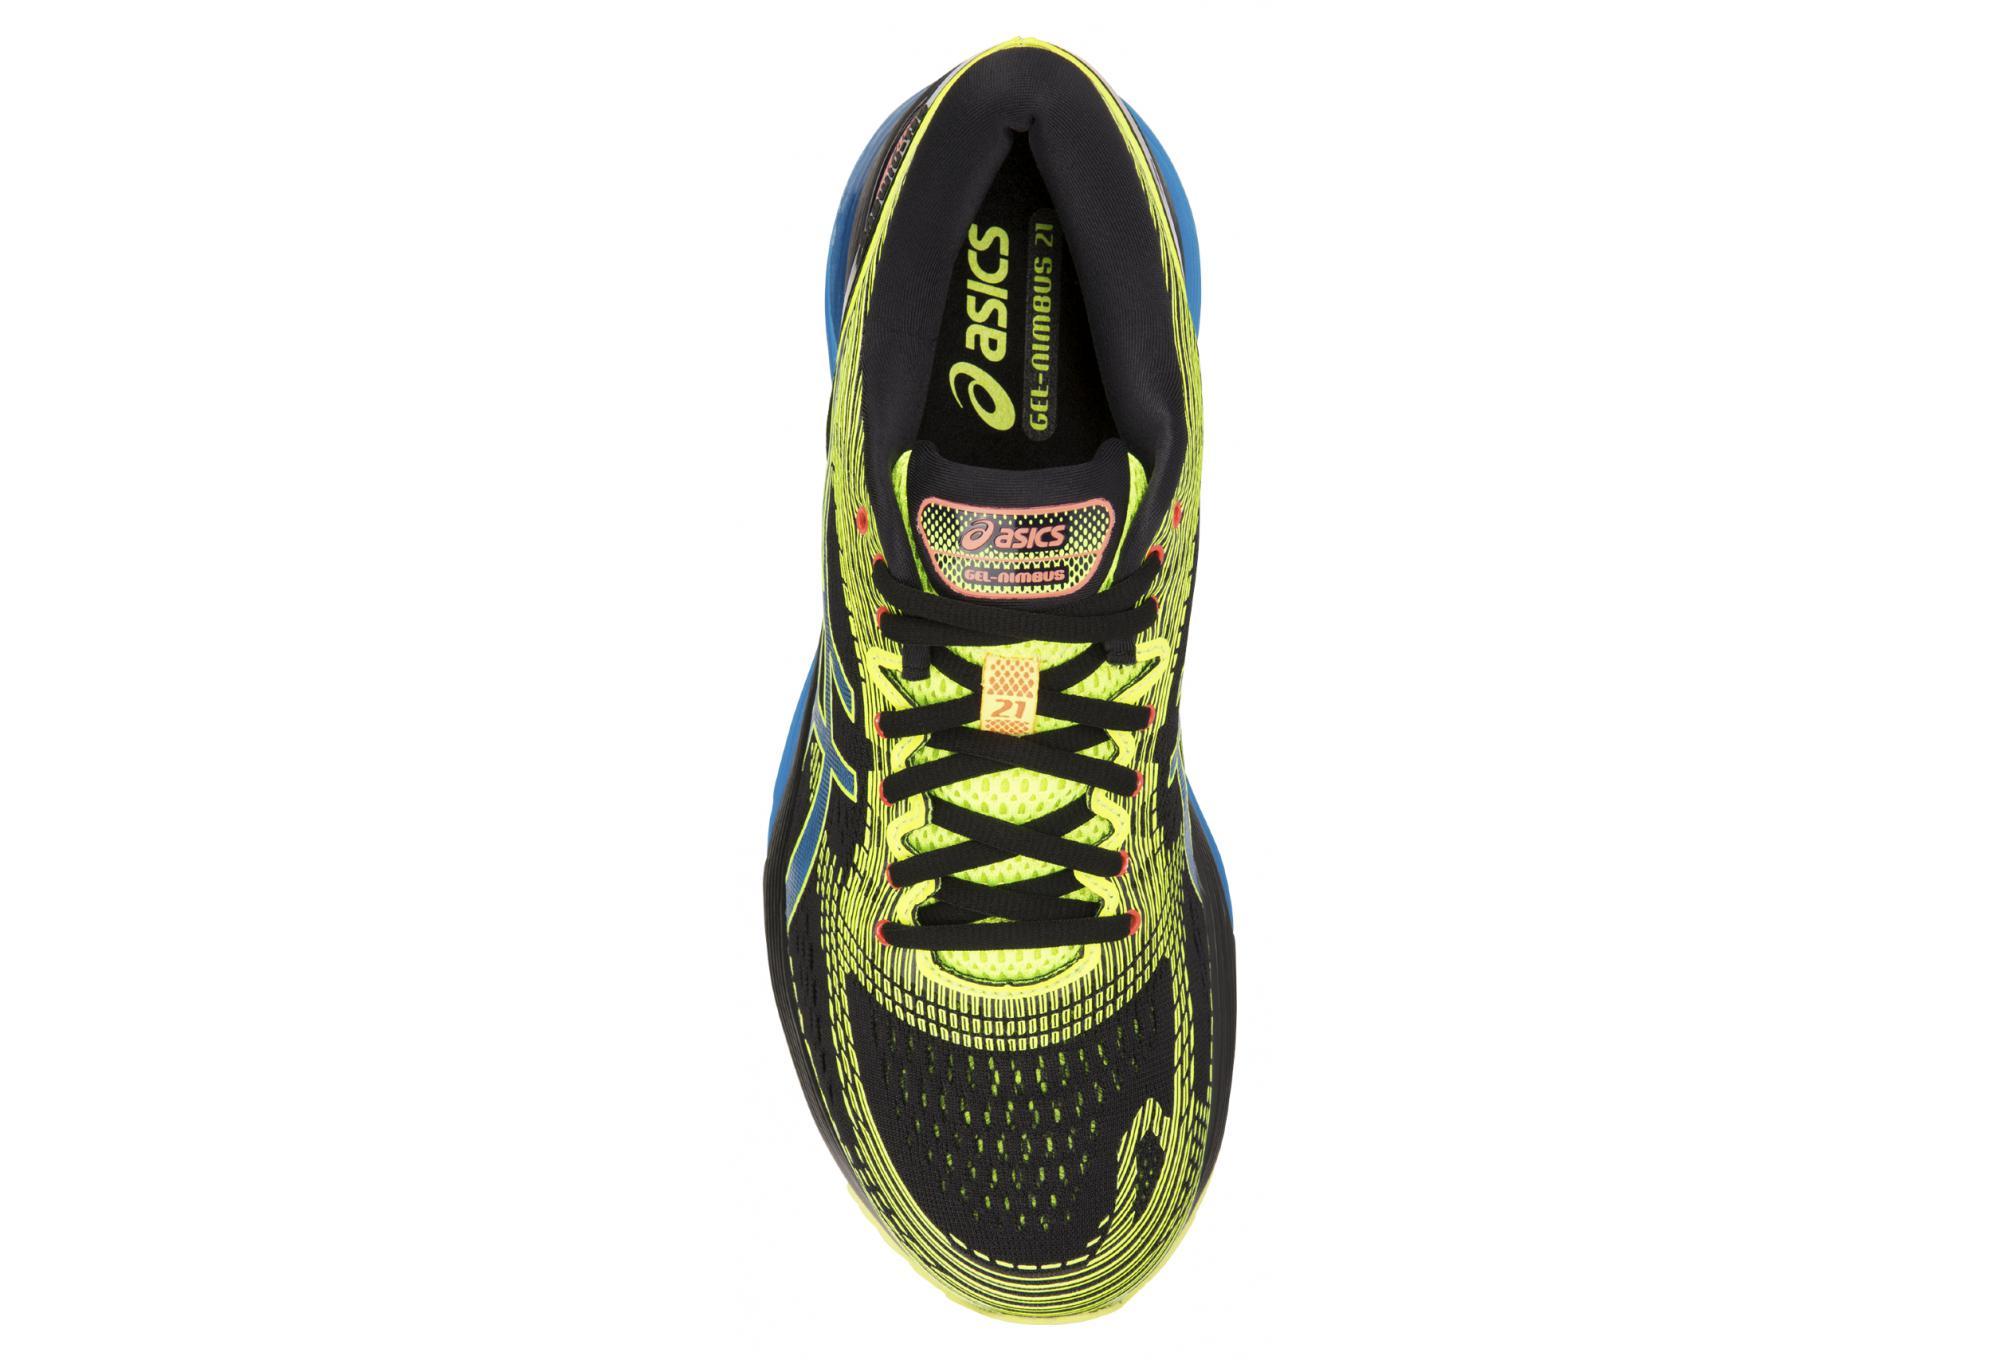 f87ab4109067 Asics Shoes Run Gel Nimbus 21 OPTIMISM Black Yellow Blue